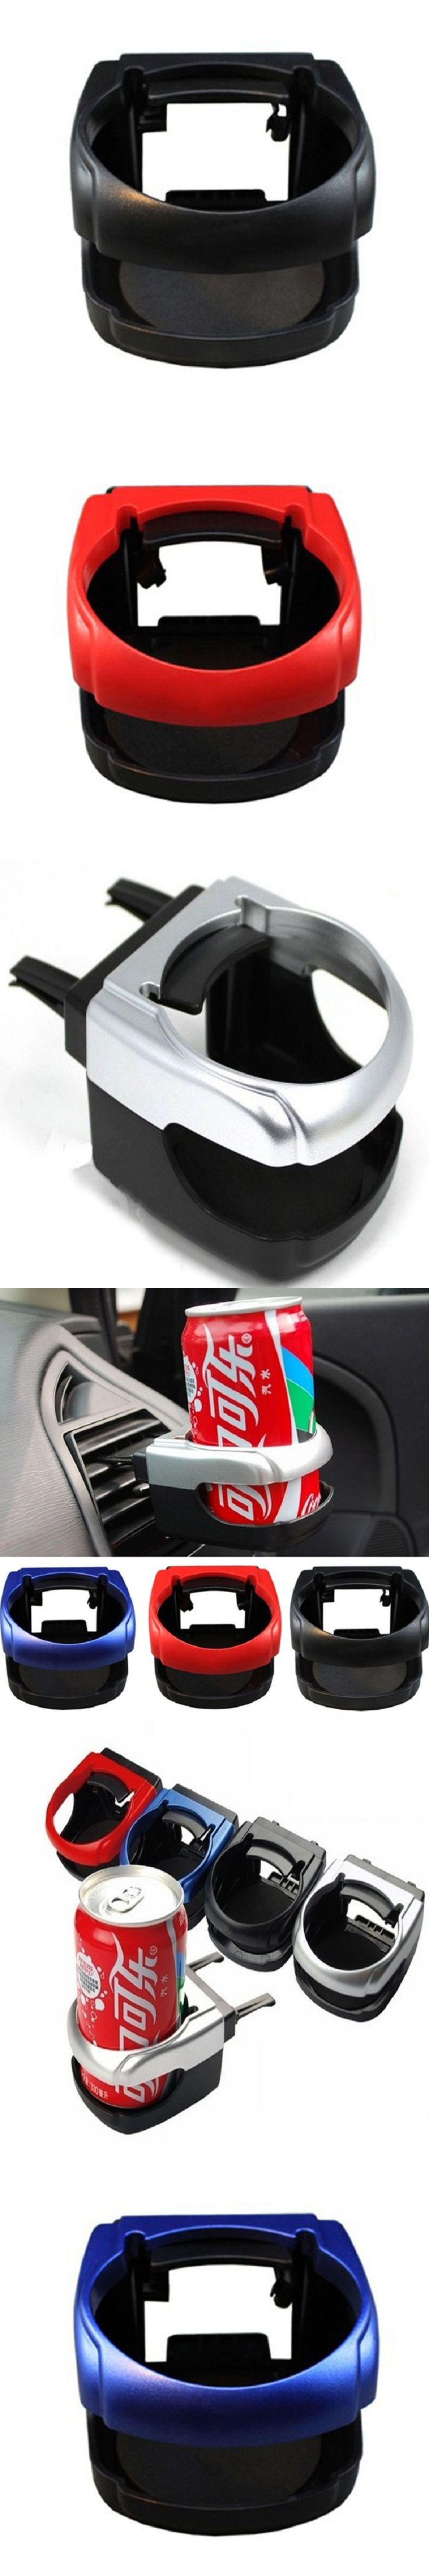 Storage Bag Auto Car Back Seat Car Seat Cover Organizer Holder Bottle tissue box Magazine Cup Food Phone Bag dropshipping  jul19